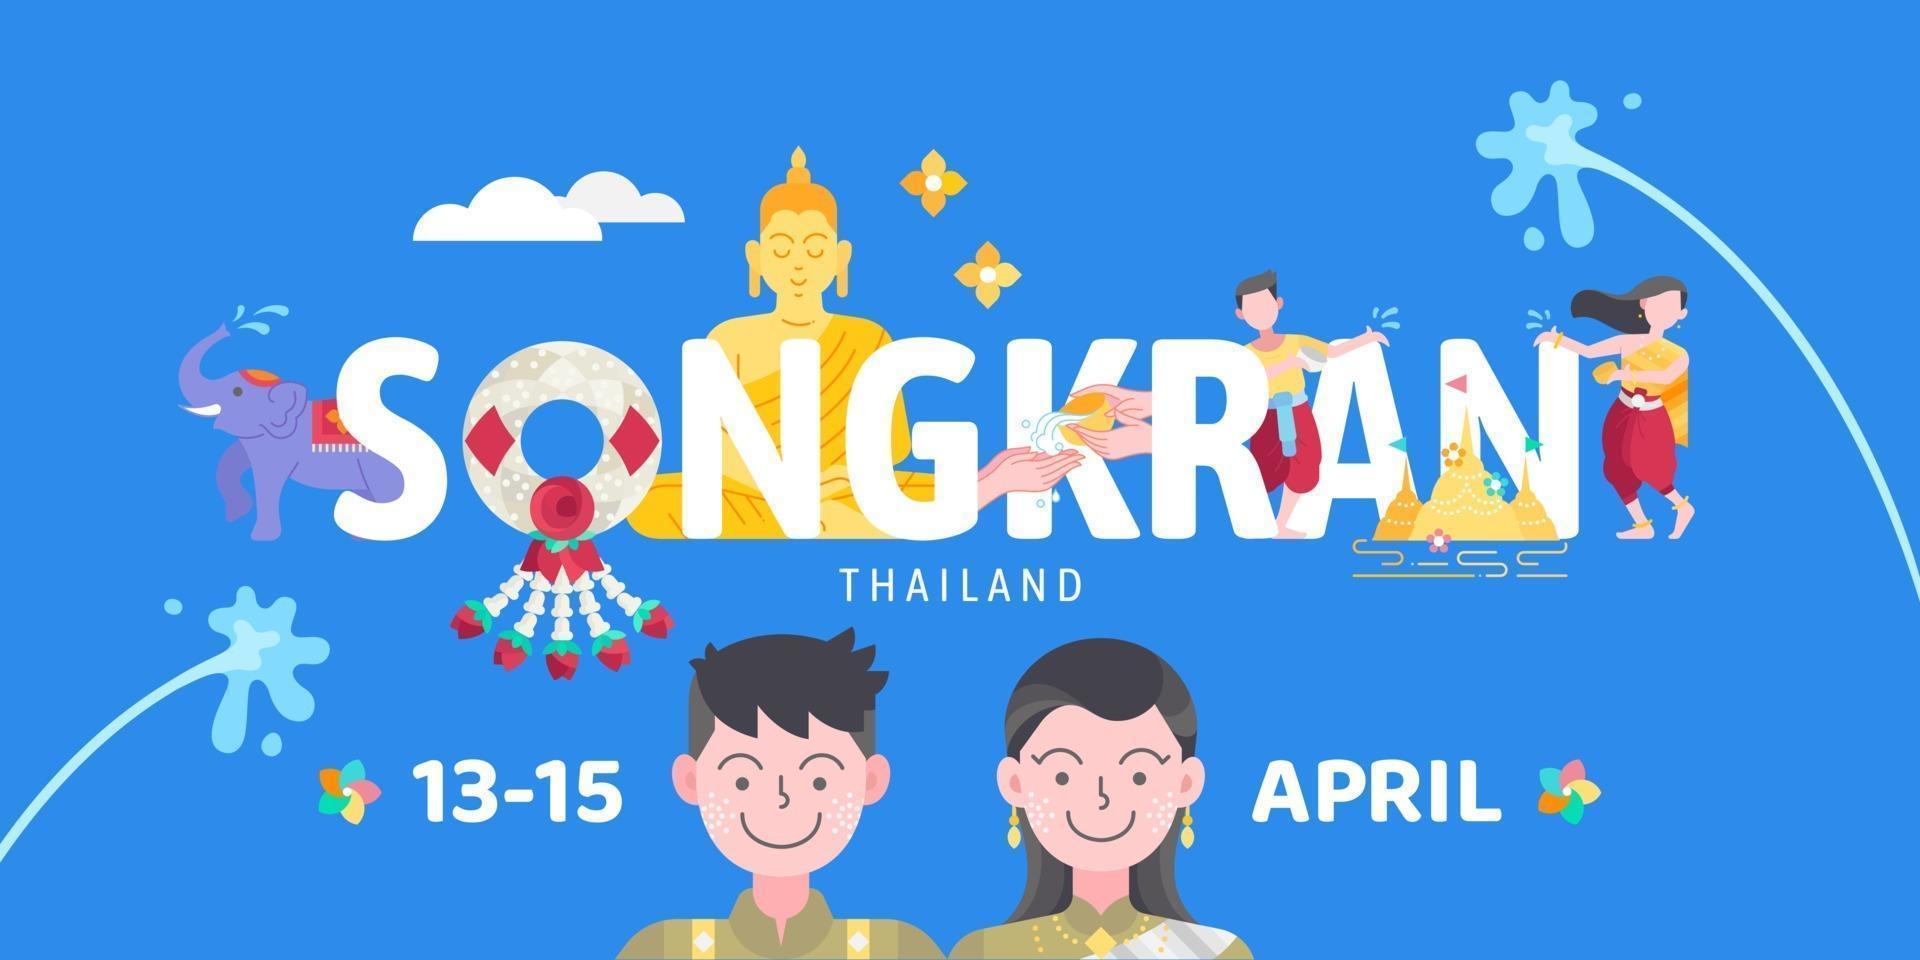 Songkran Thailand water splashing festival celebration vector illustration